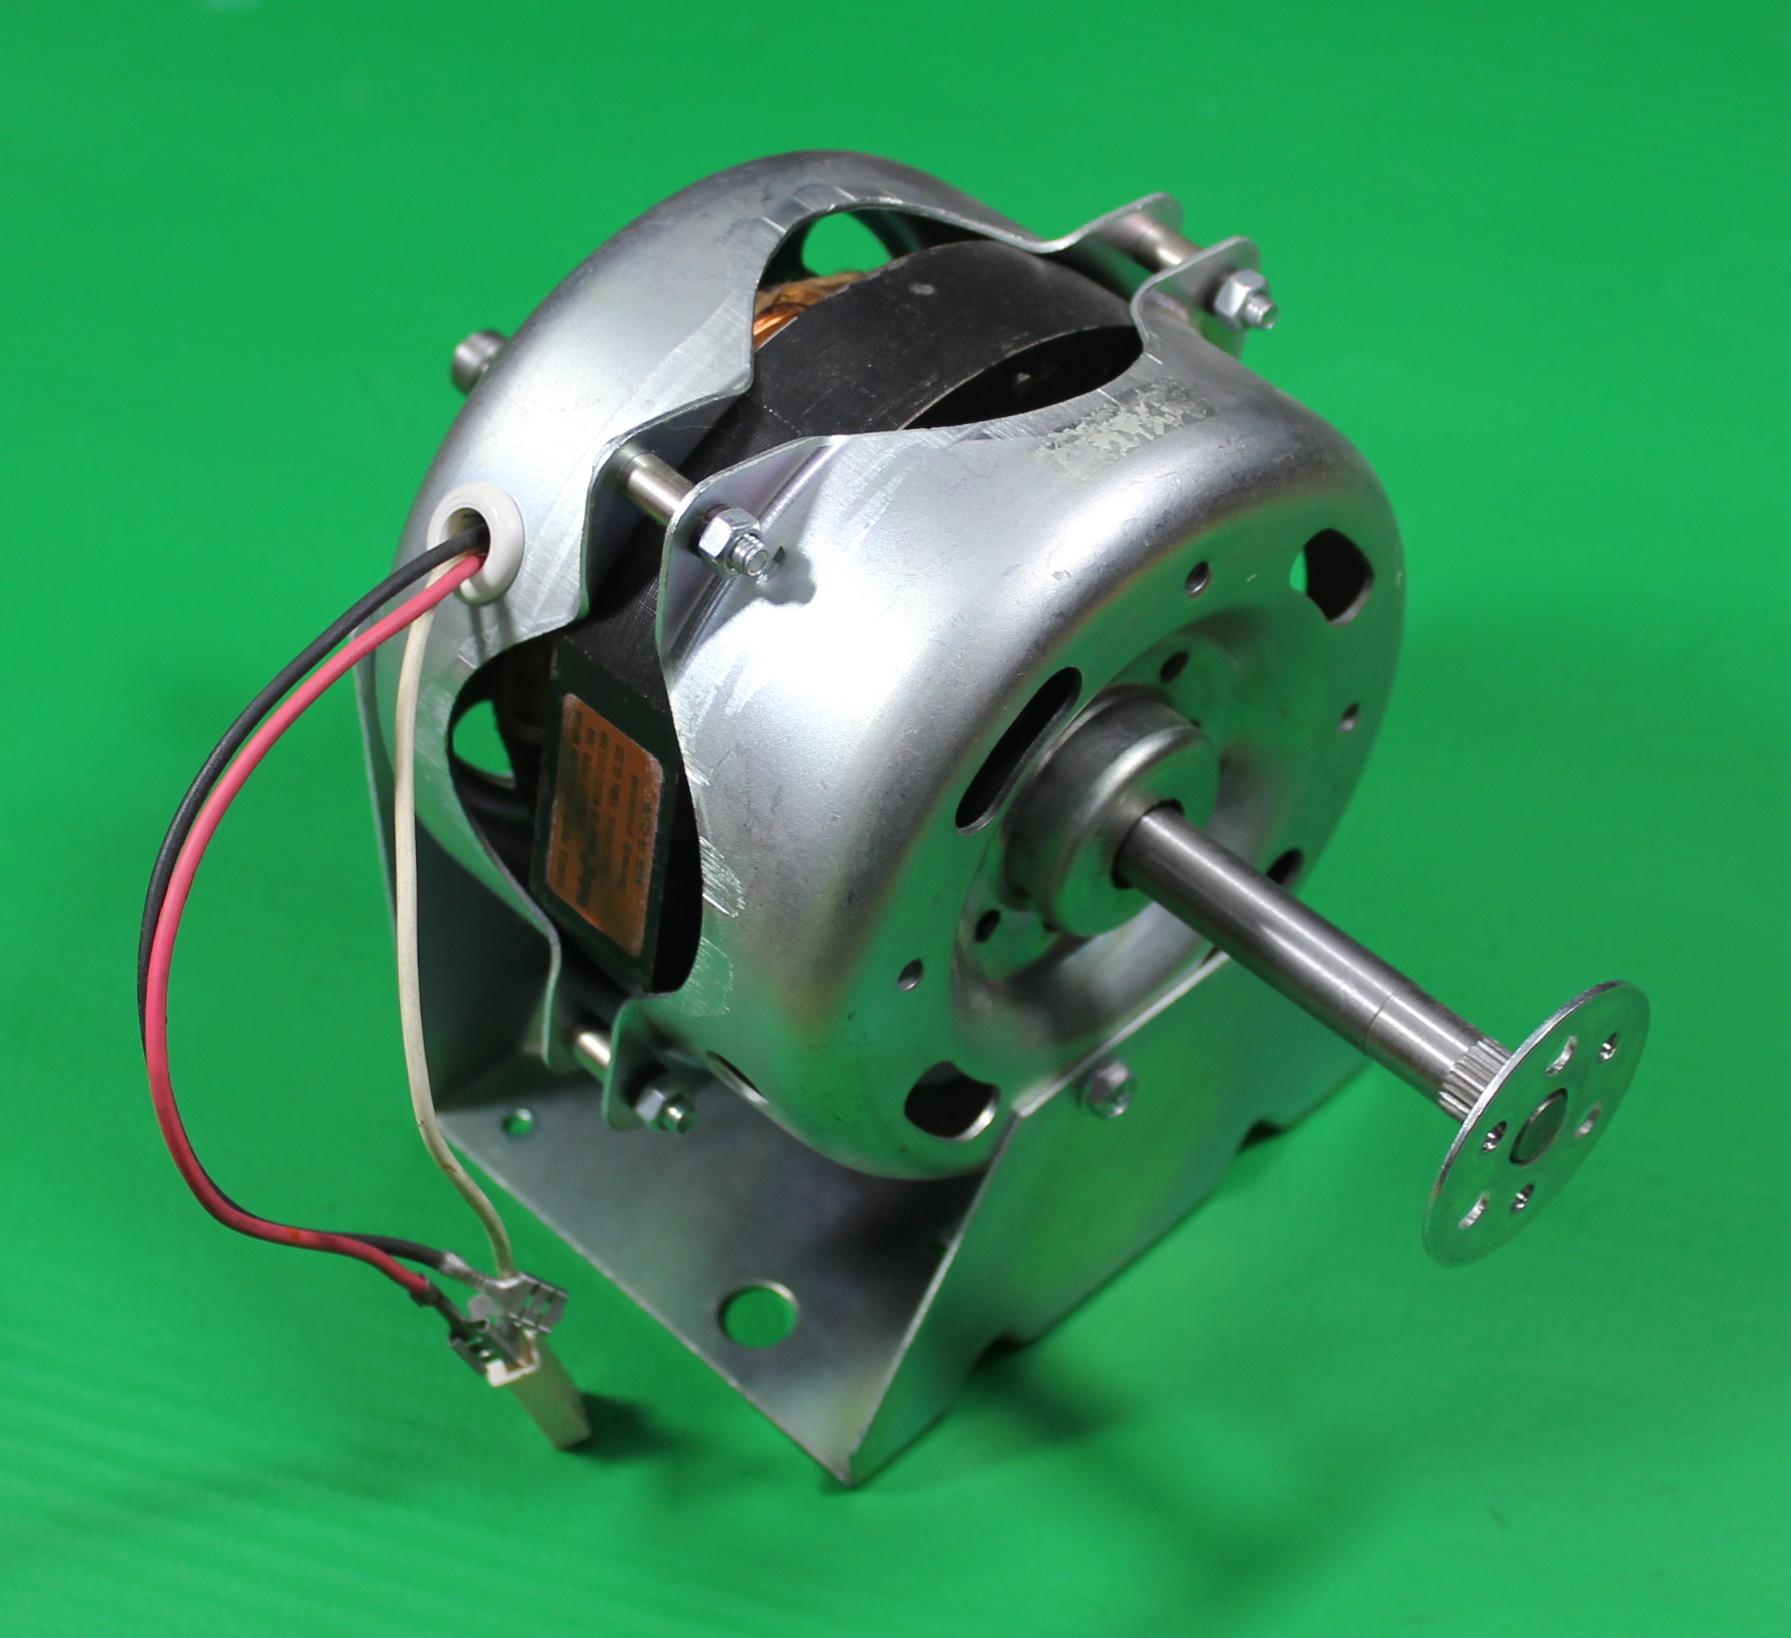 Hotpoint Tvm560 Tumble Dryer Motor Welling Yxh80 2b Ebay